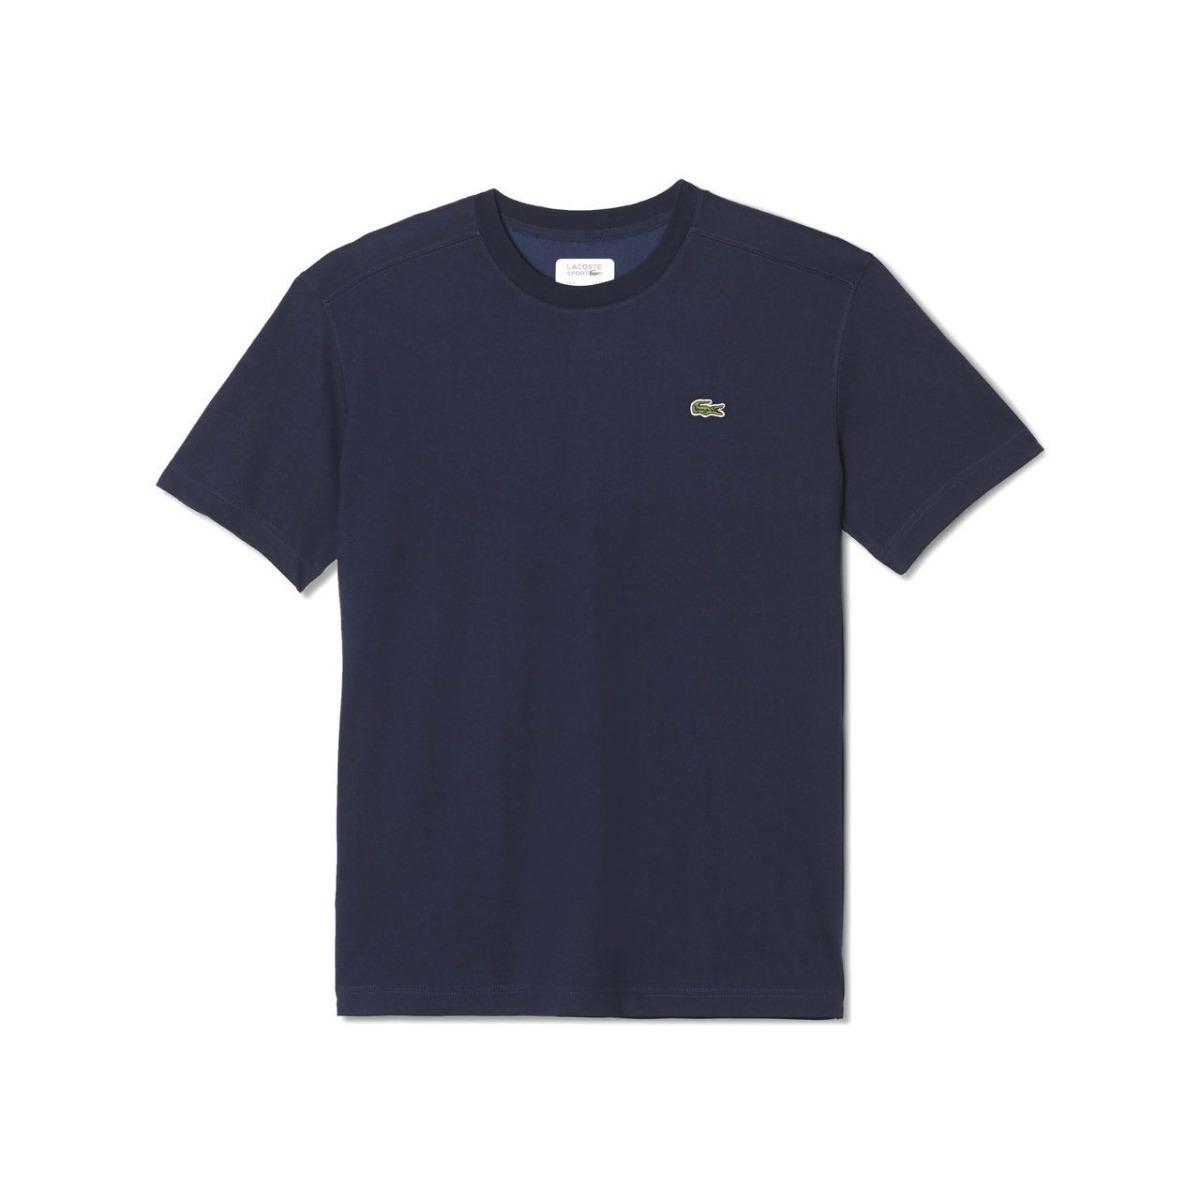 920d4bff1ebe4 camiseta gola careca lacoste sport de jersey - loja física. Carregando zoom.